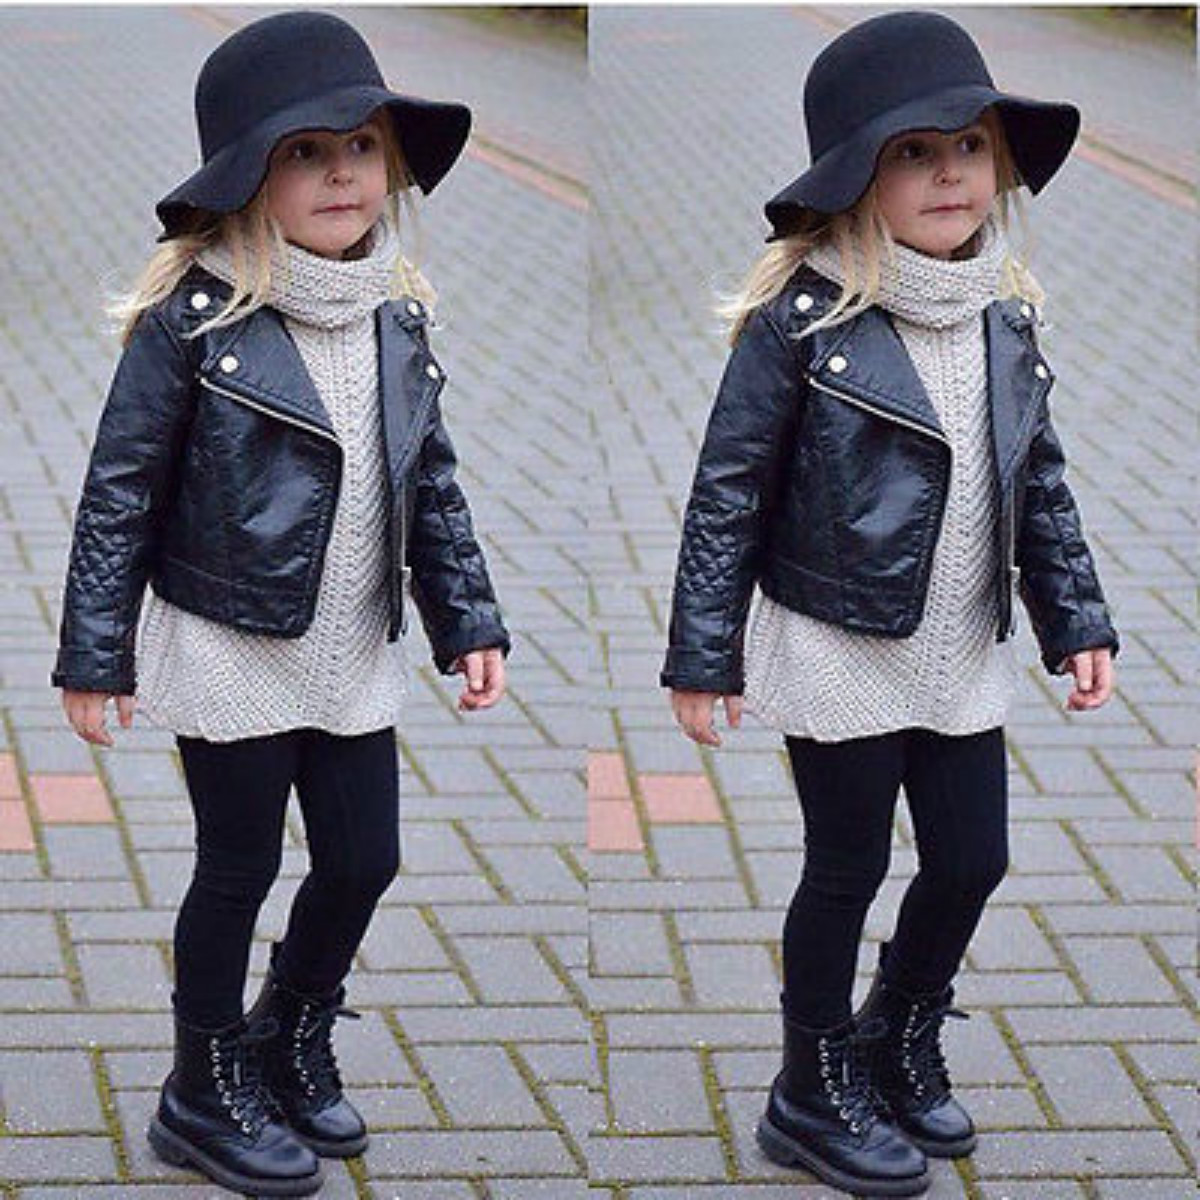 Leather jackets for kids - Child Toddler Kids Girls Clothing Faux Leather Pu Jacket Zippered Thin Coats Size 2 7